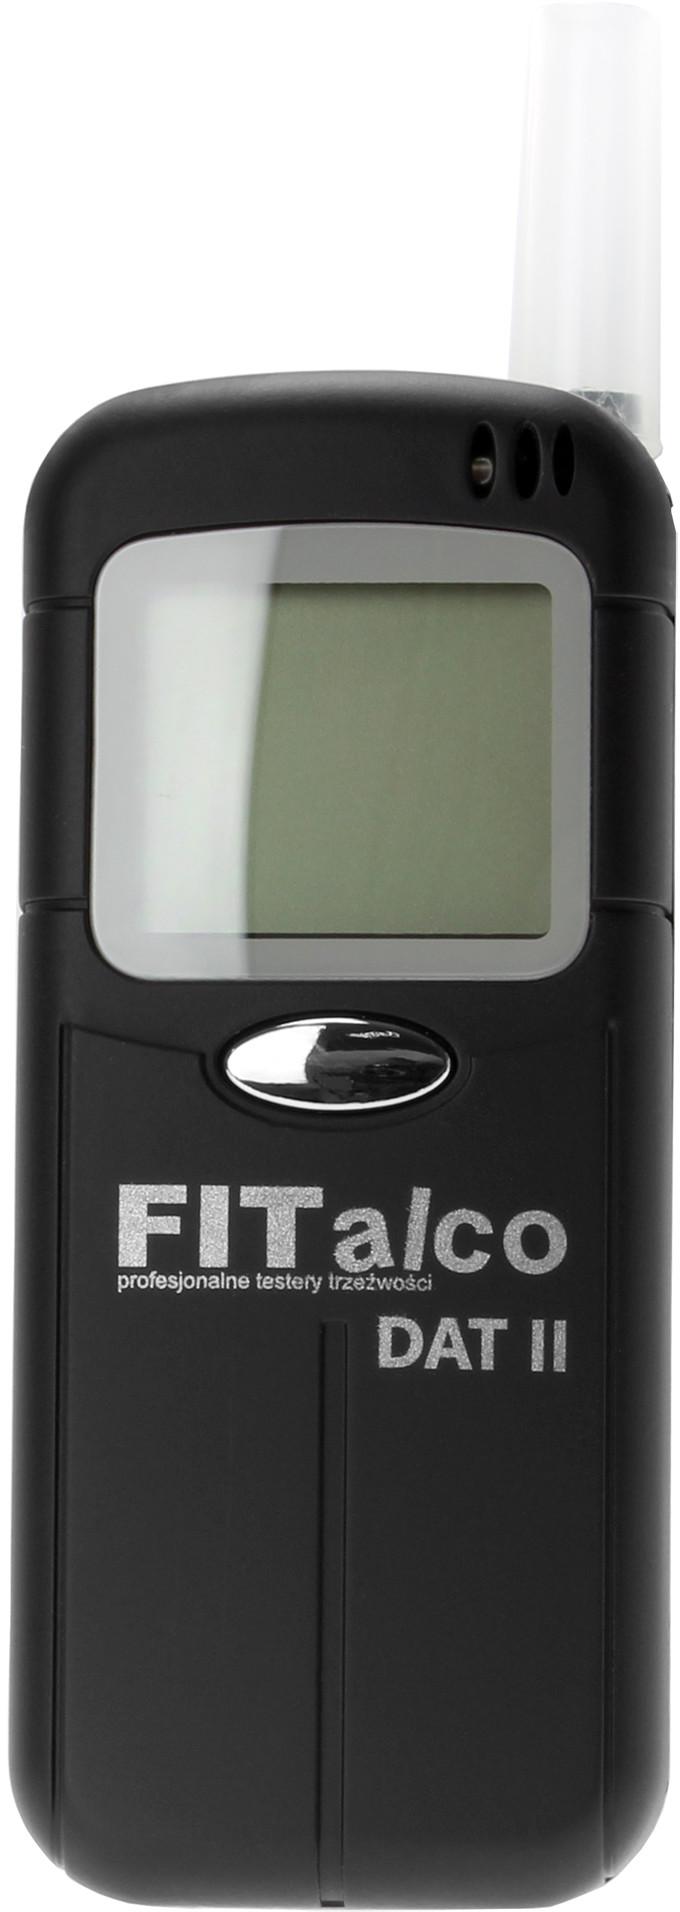 Fitalco DAT II